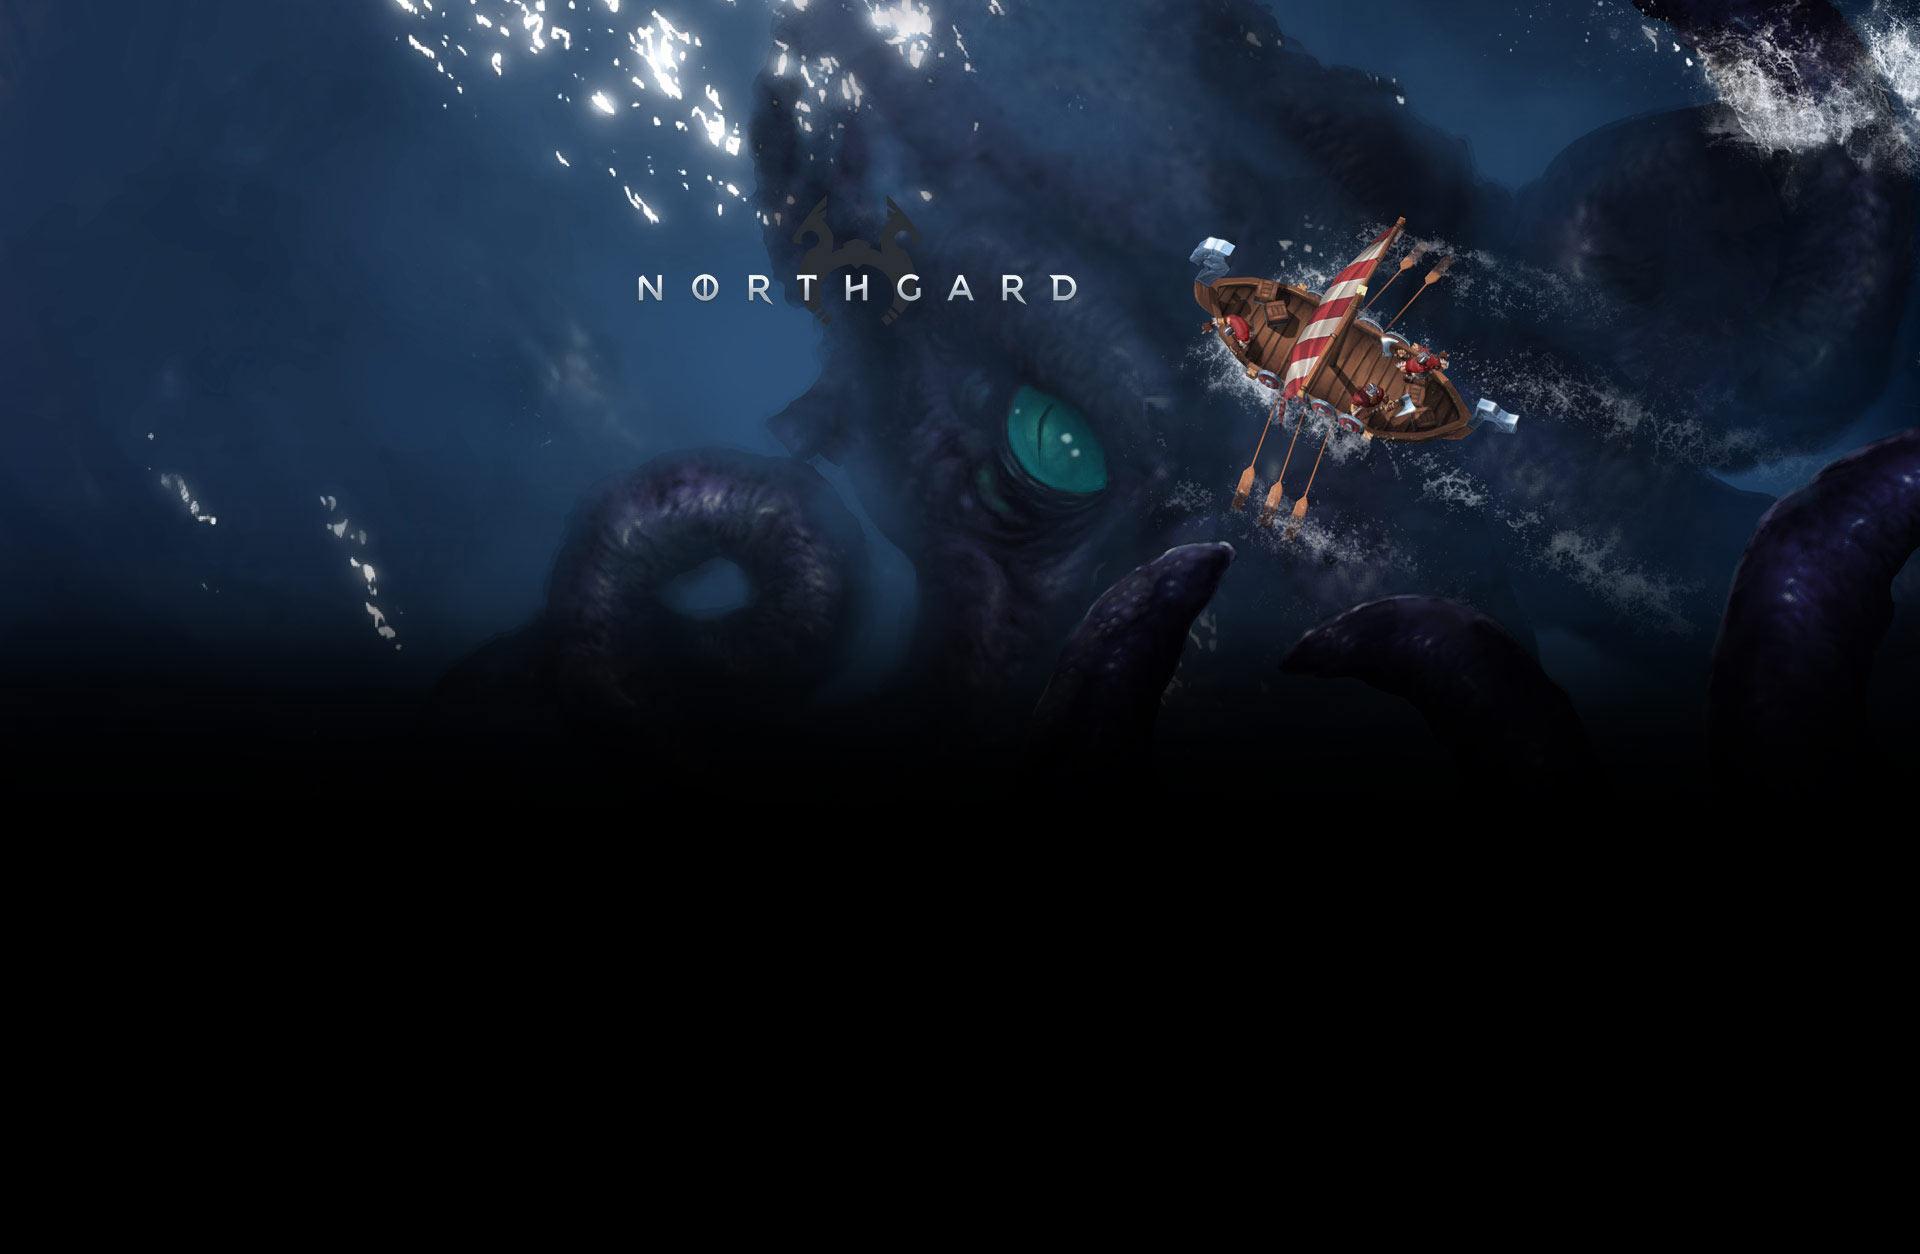 Northgard - lyngbakr clan of the kraken download utorrent